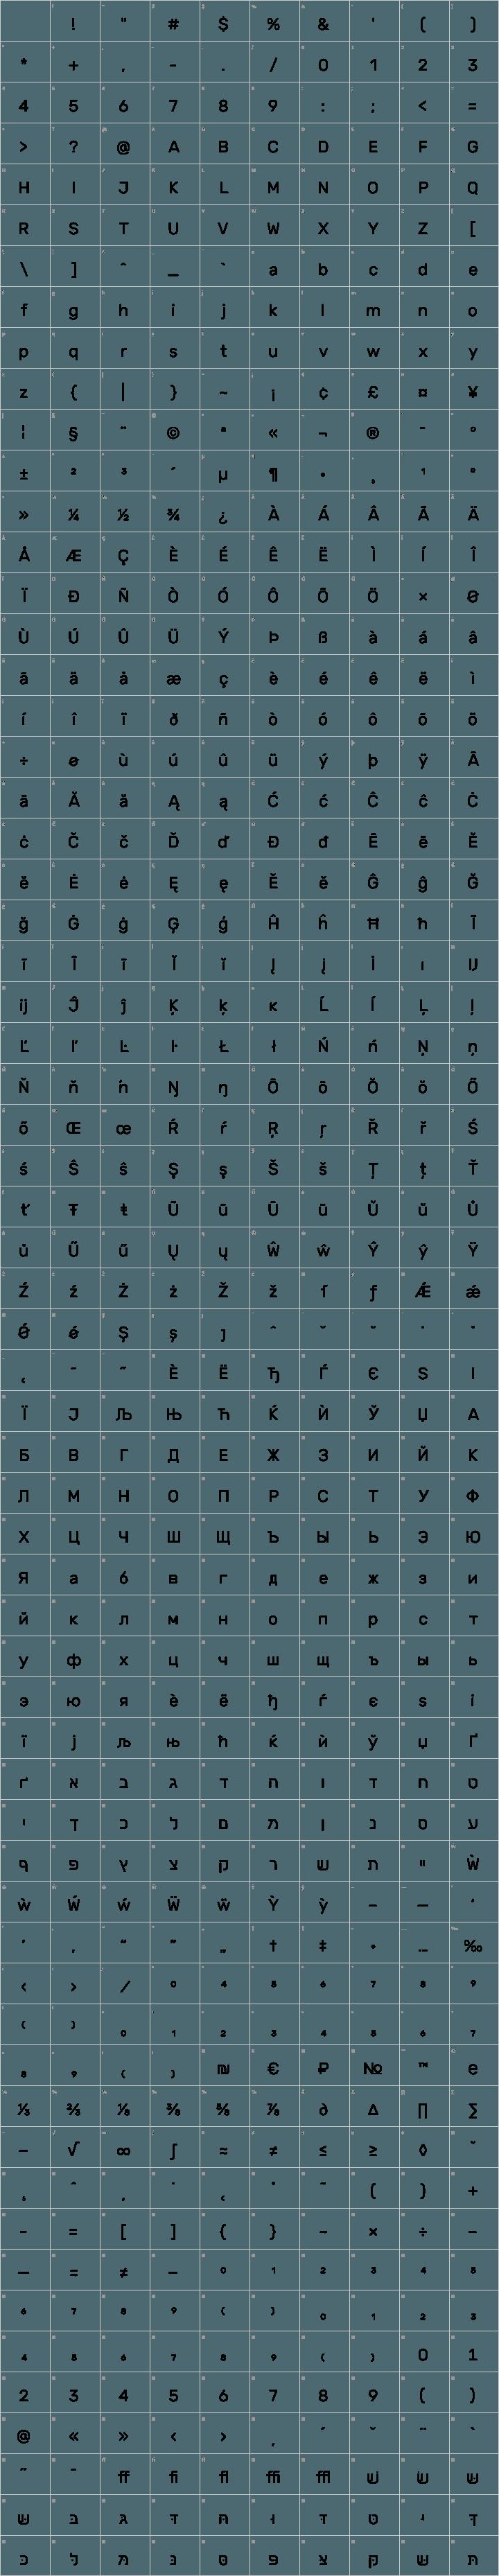 Rubik Font Free by Hubert & Fischer » Font Squirrel